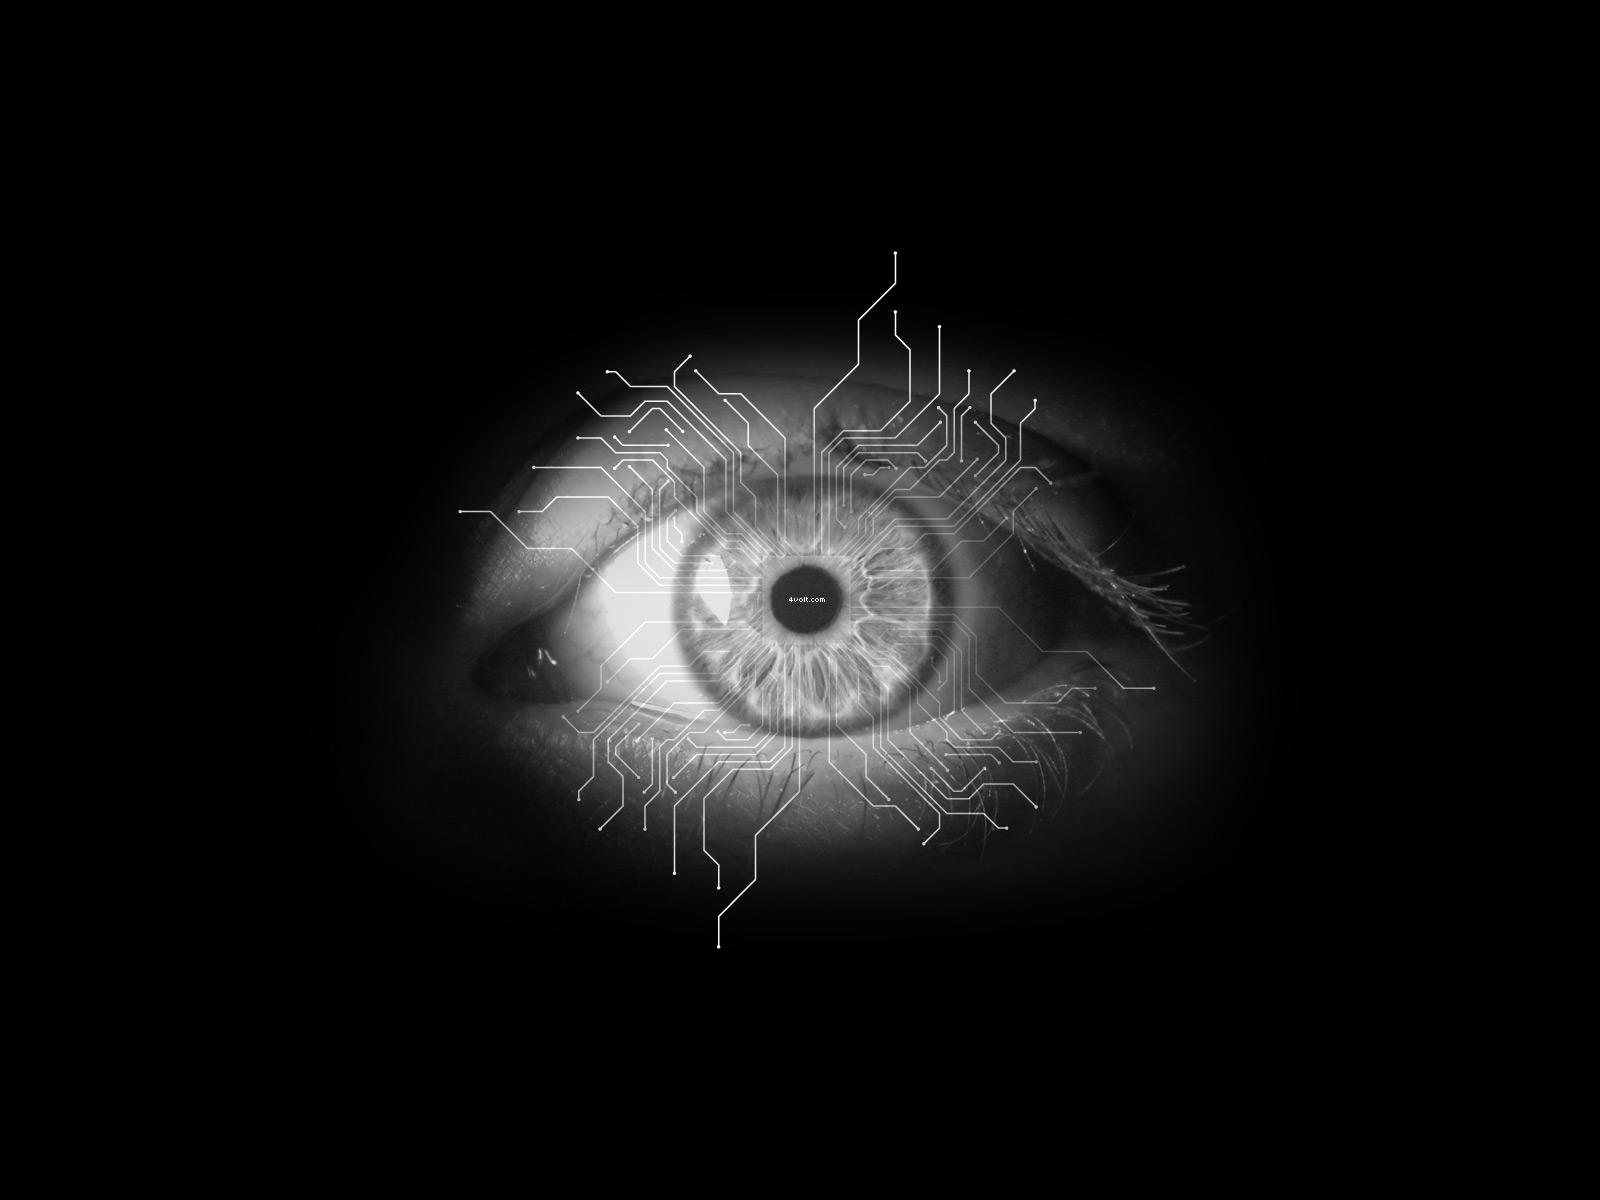 black eyes wallpaper beautiful black eyes wallpapers black cat eyes 1600x1200